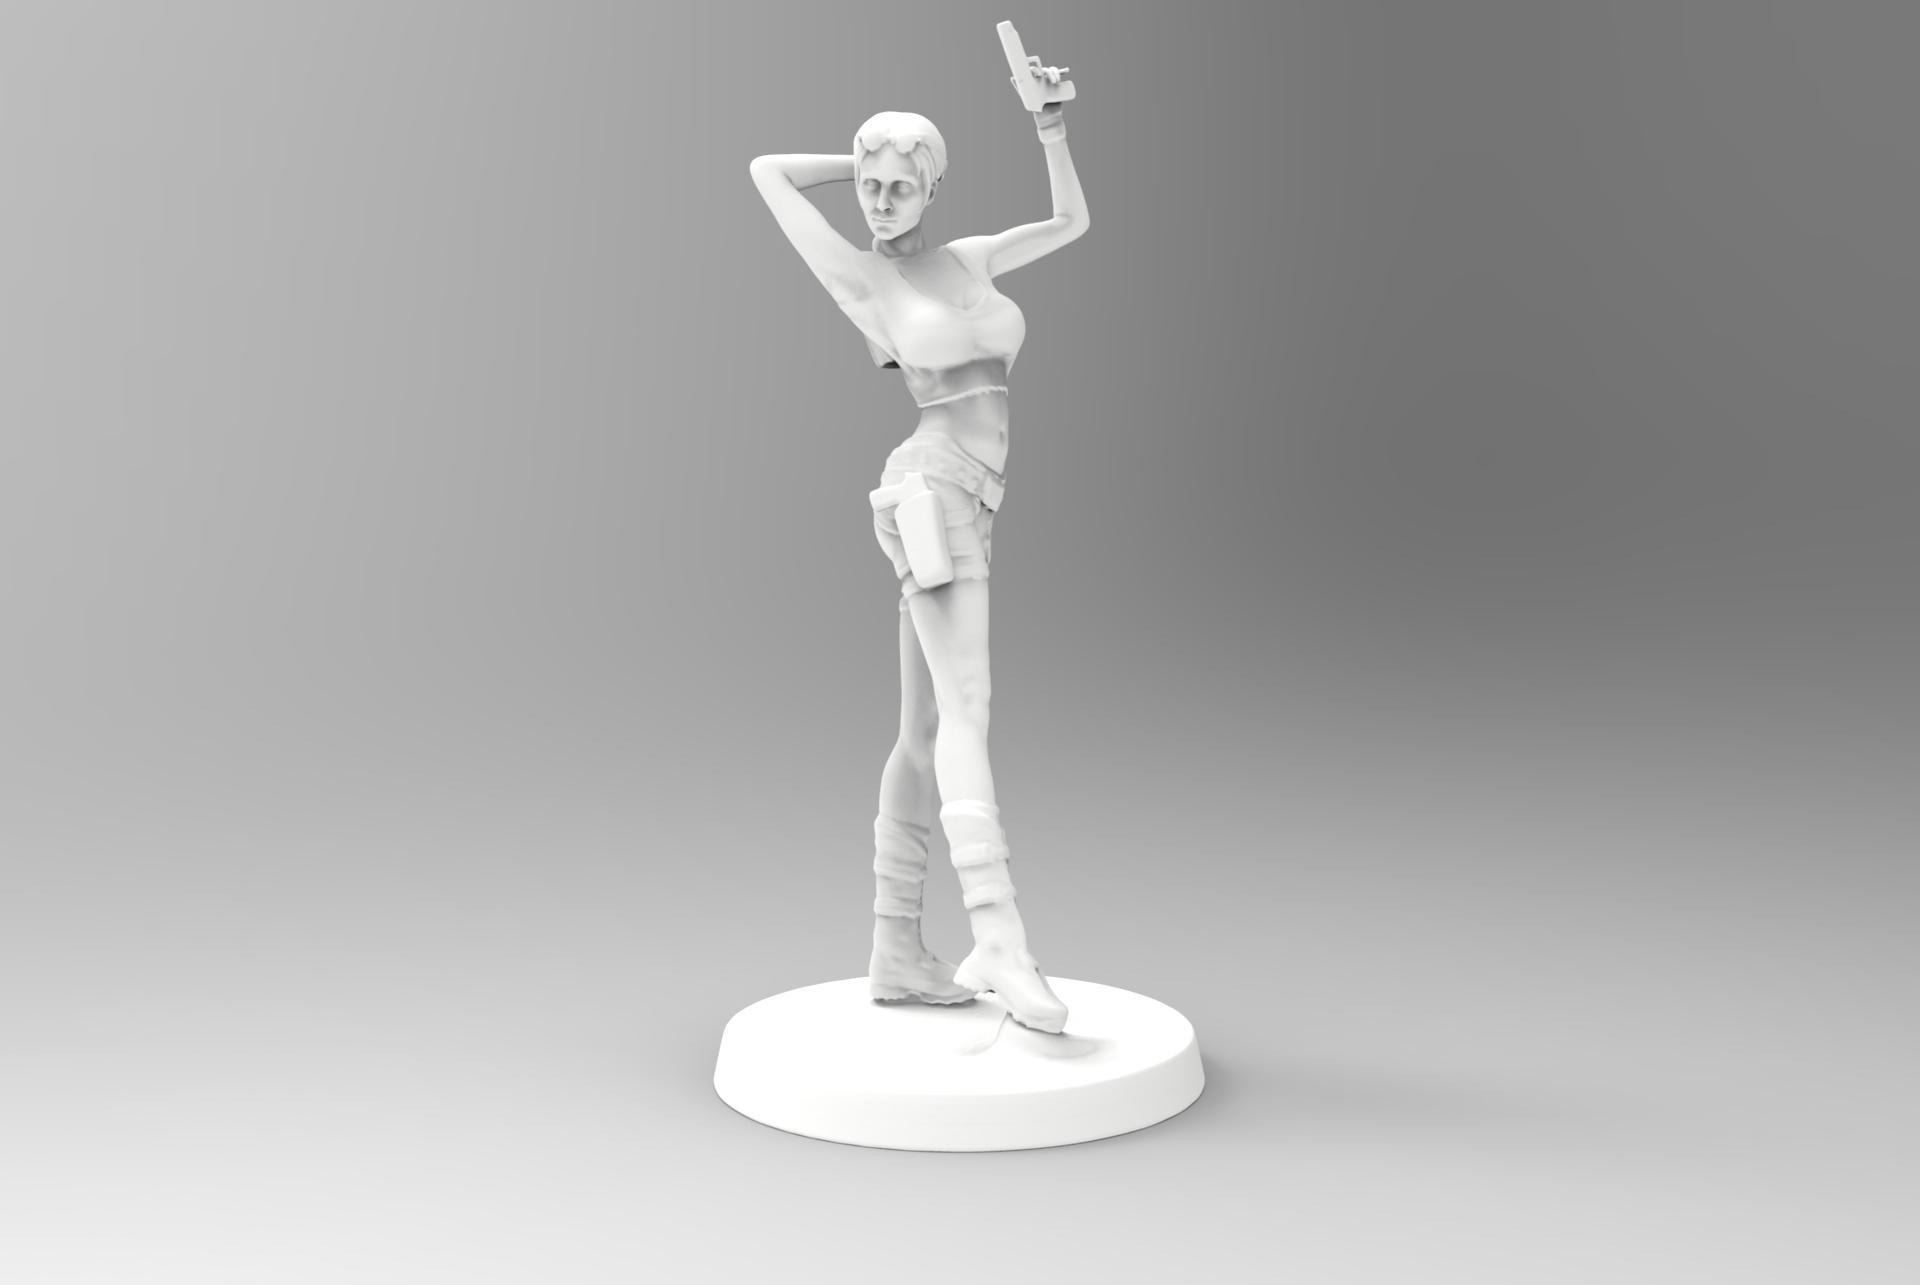 product designer 3d rendering